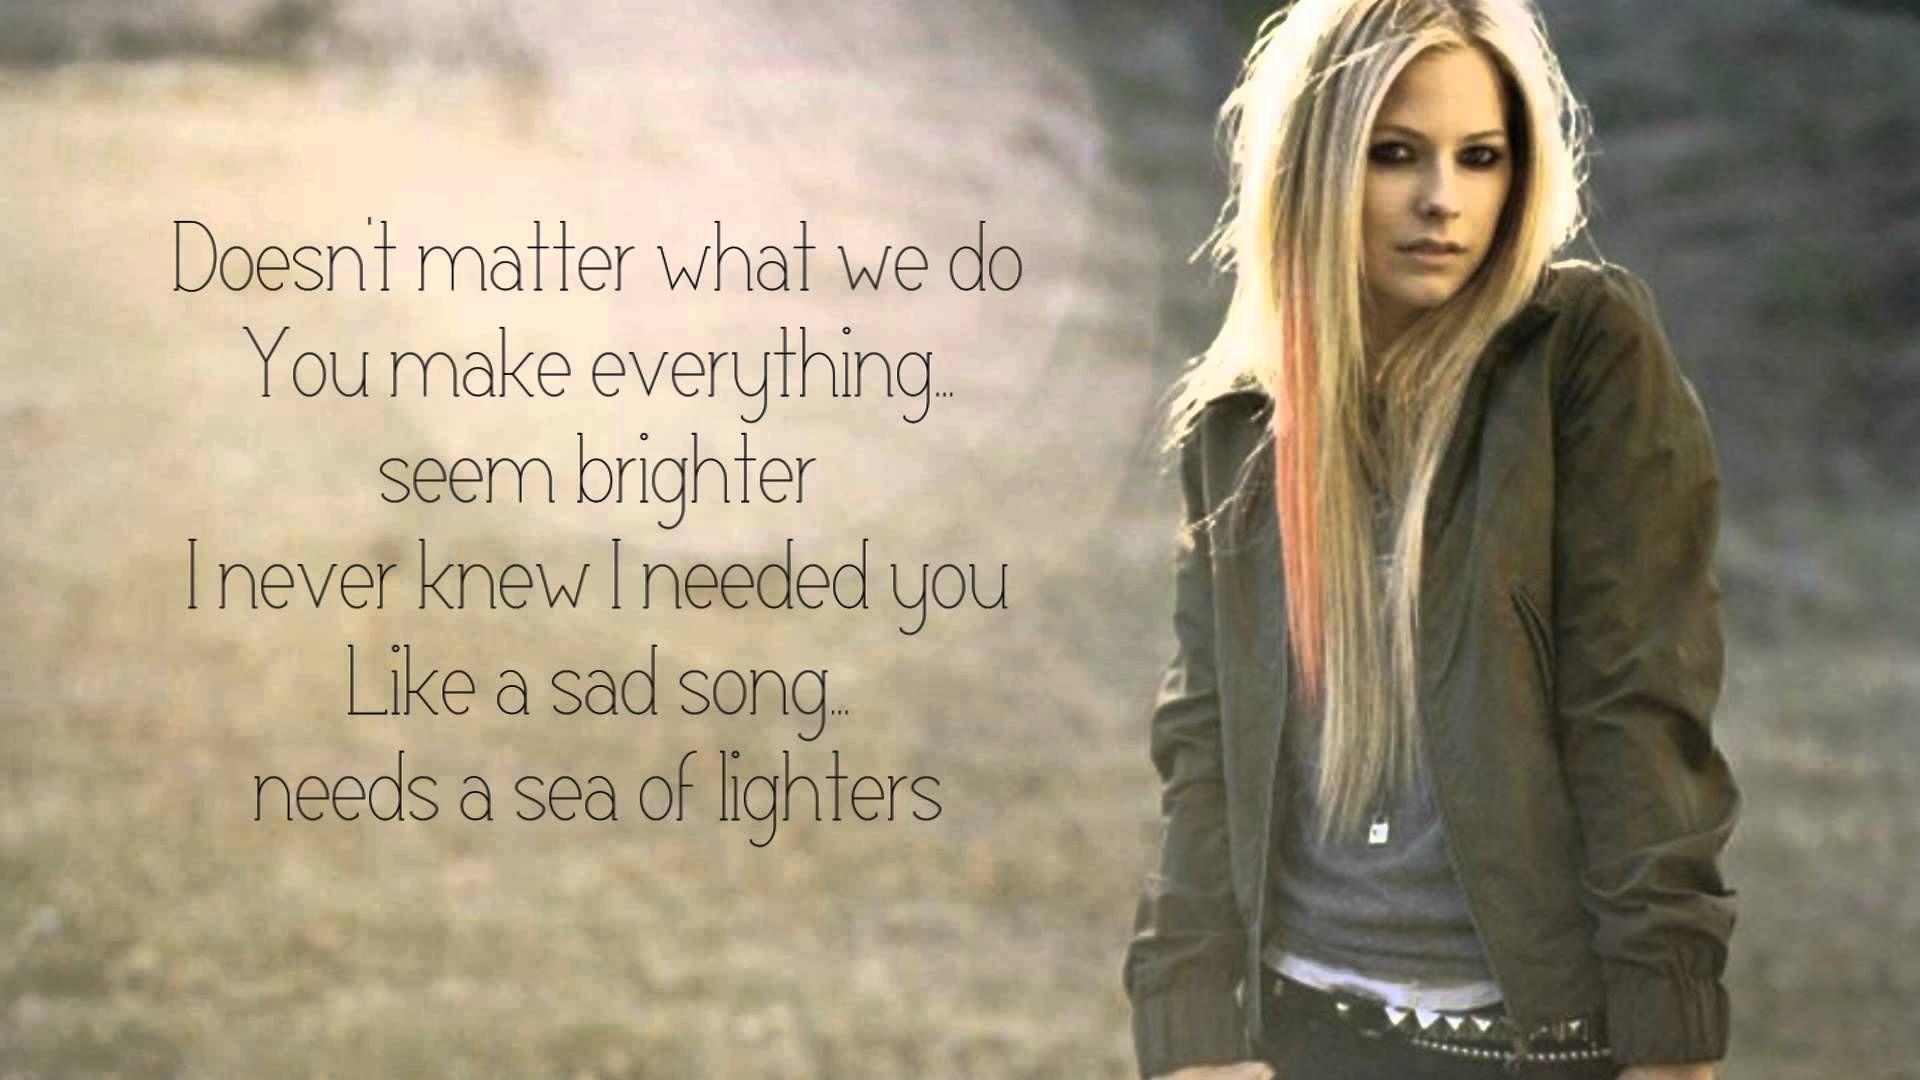 Avril Lavigne Falling Fast Lyric On Screen Hq New Song 2013 Fast Lyrics Avril Lavigne Songs 2013